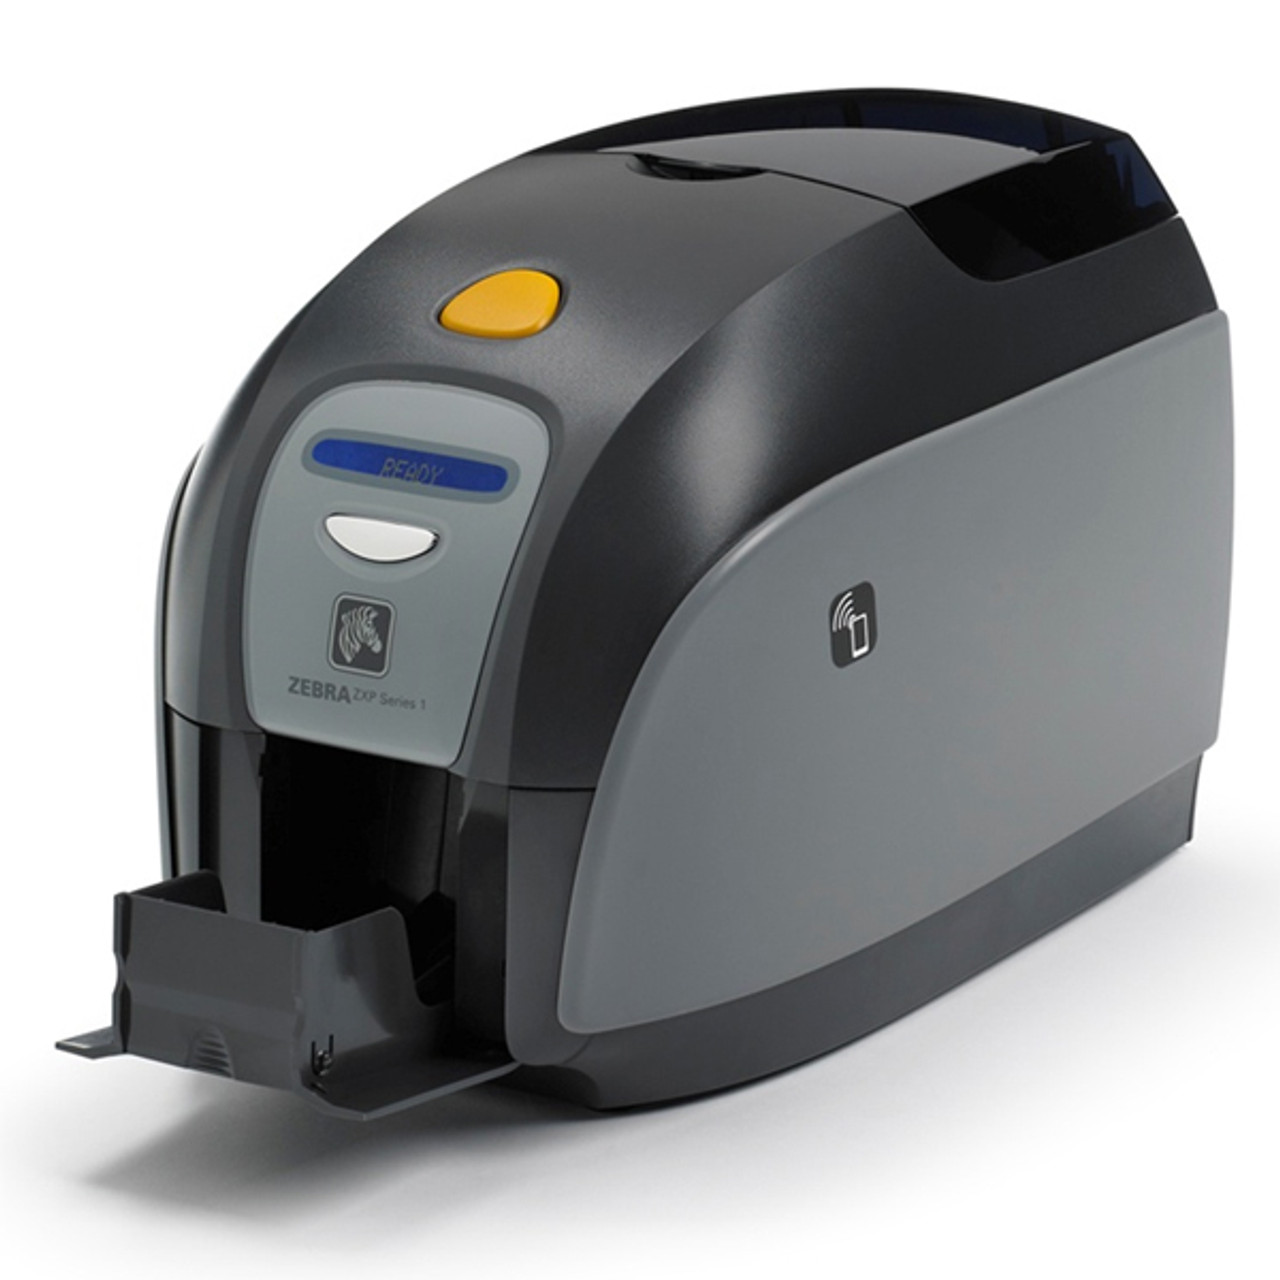 Zebra ID Printers